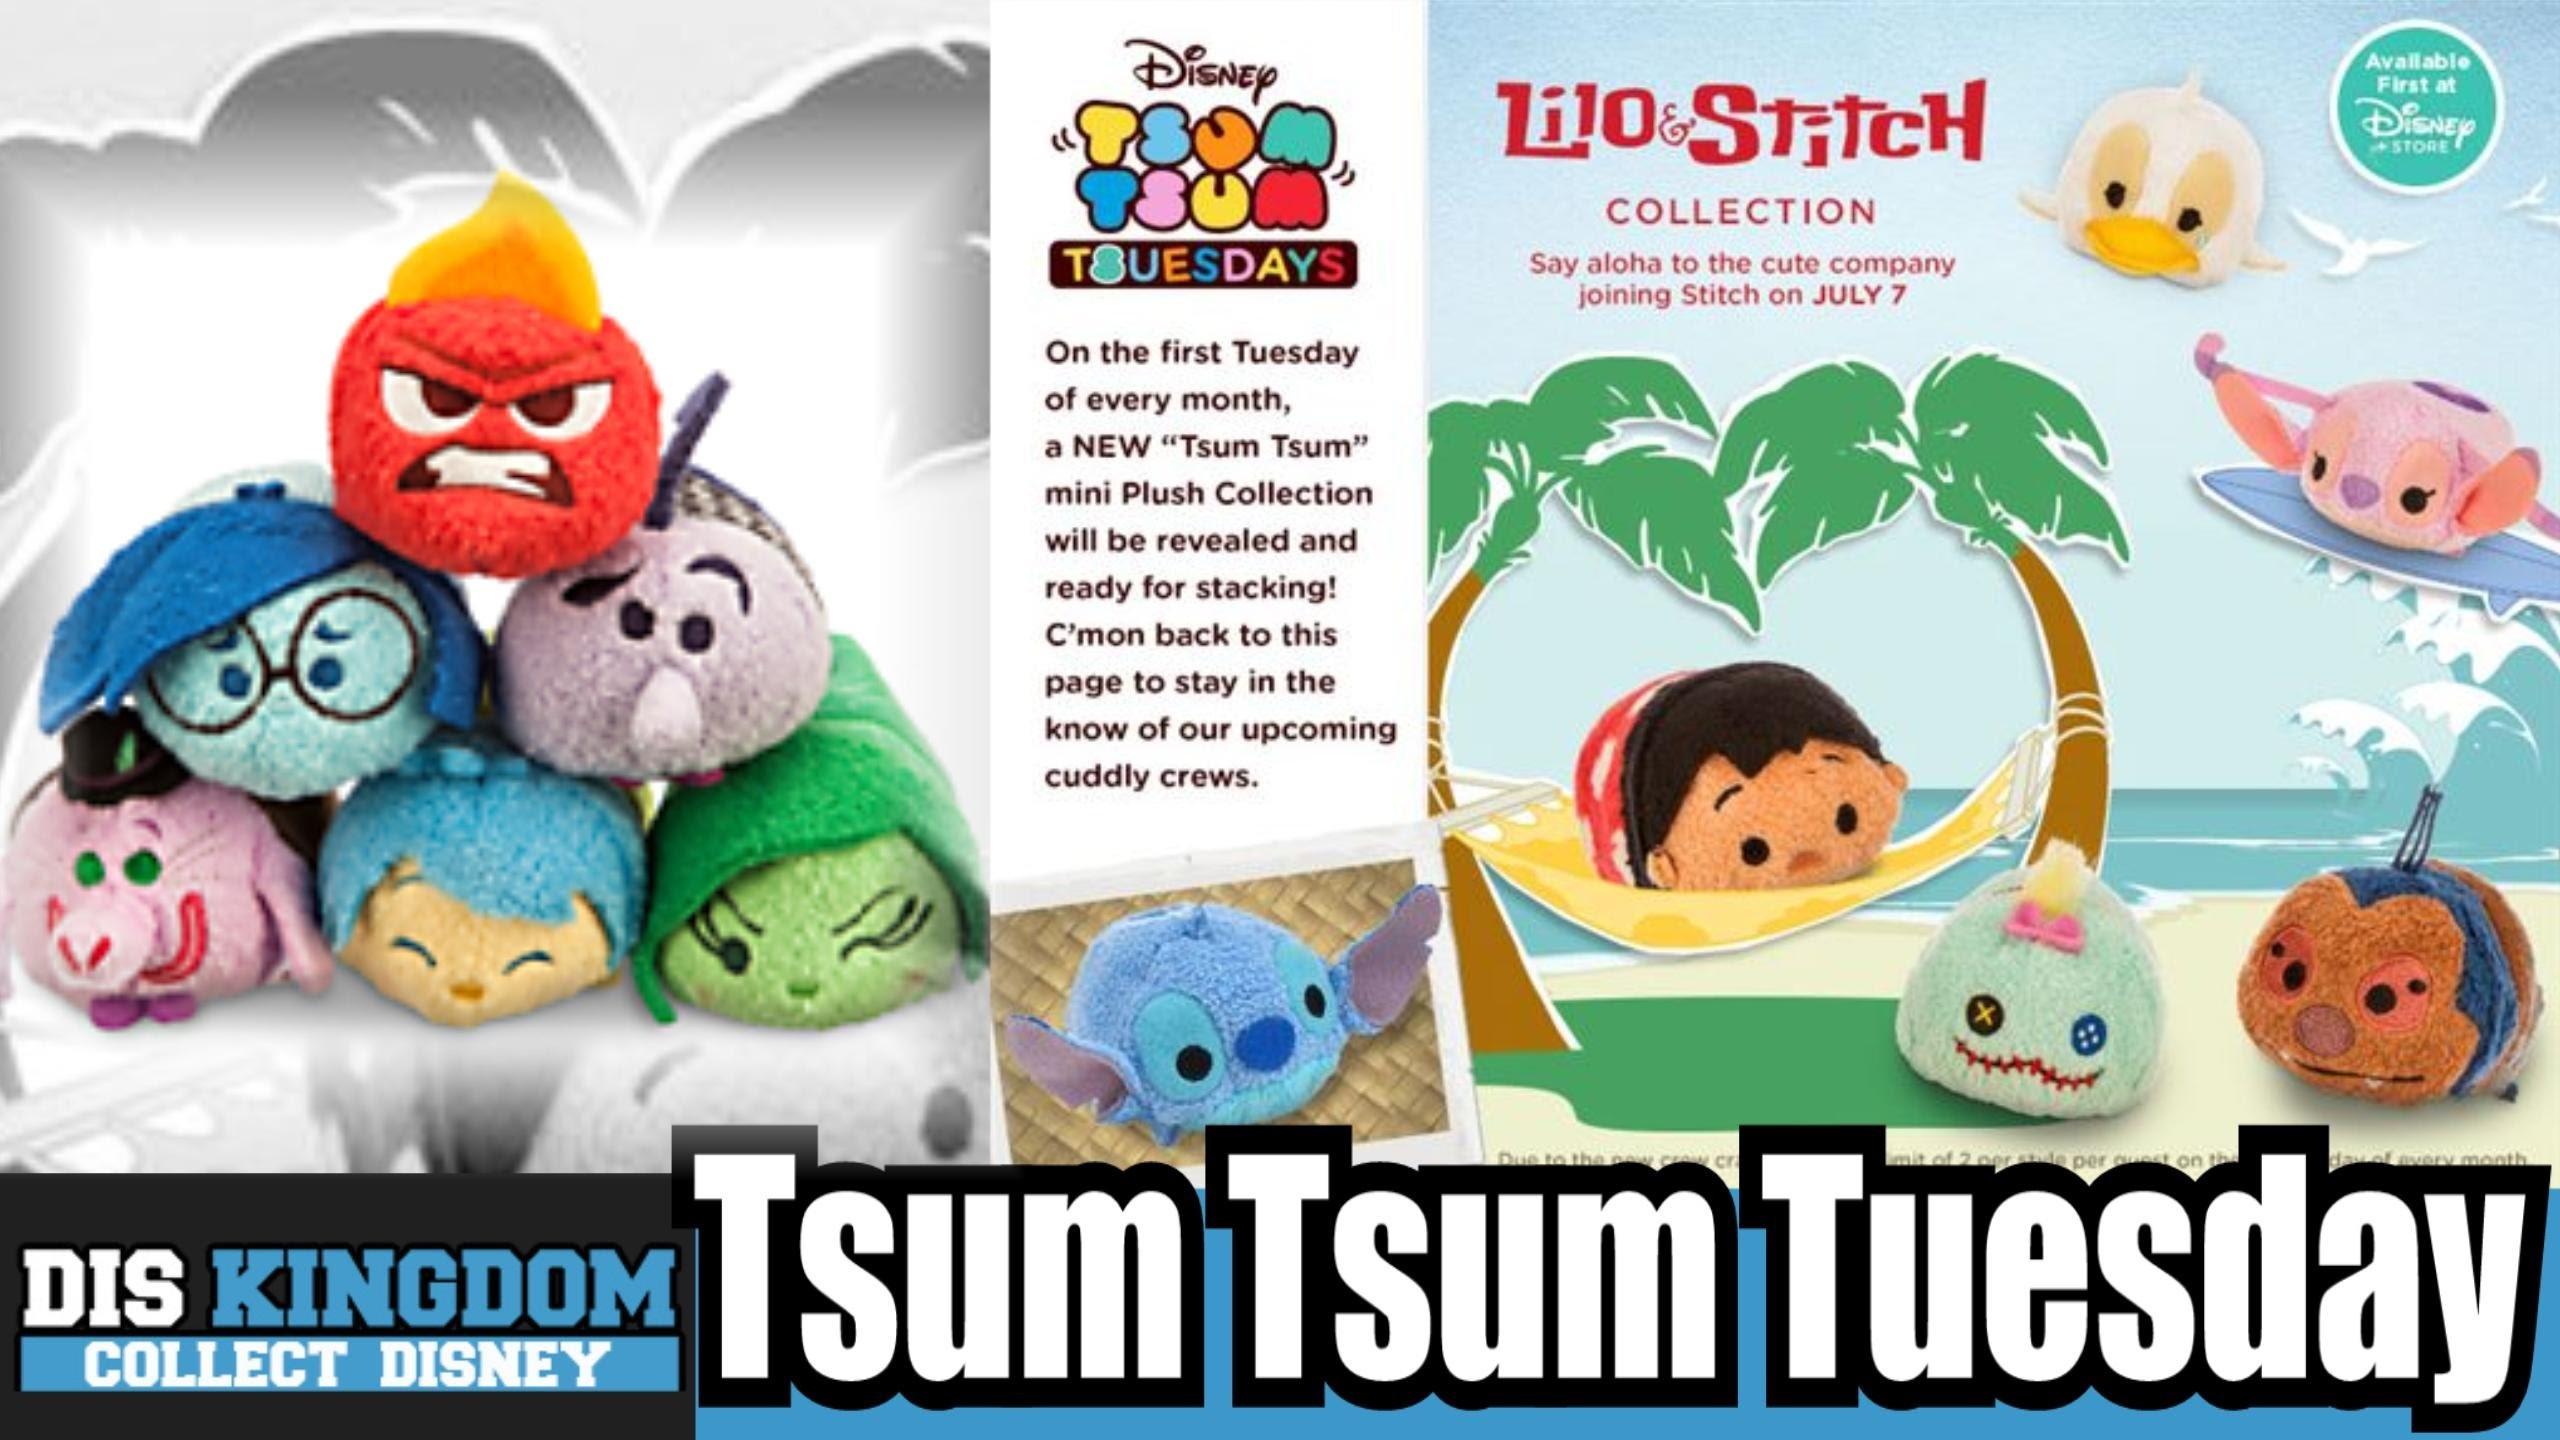 Inside Out + Lilo & Stitch Tsum Tsum Tuesday